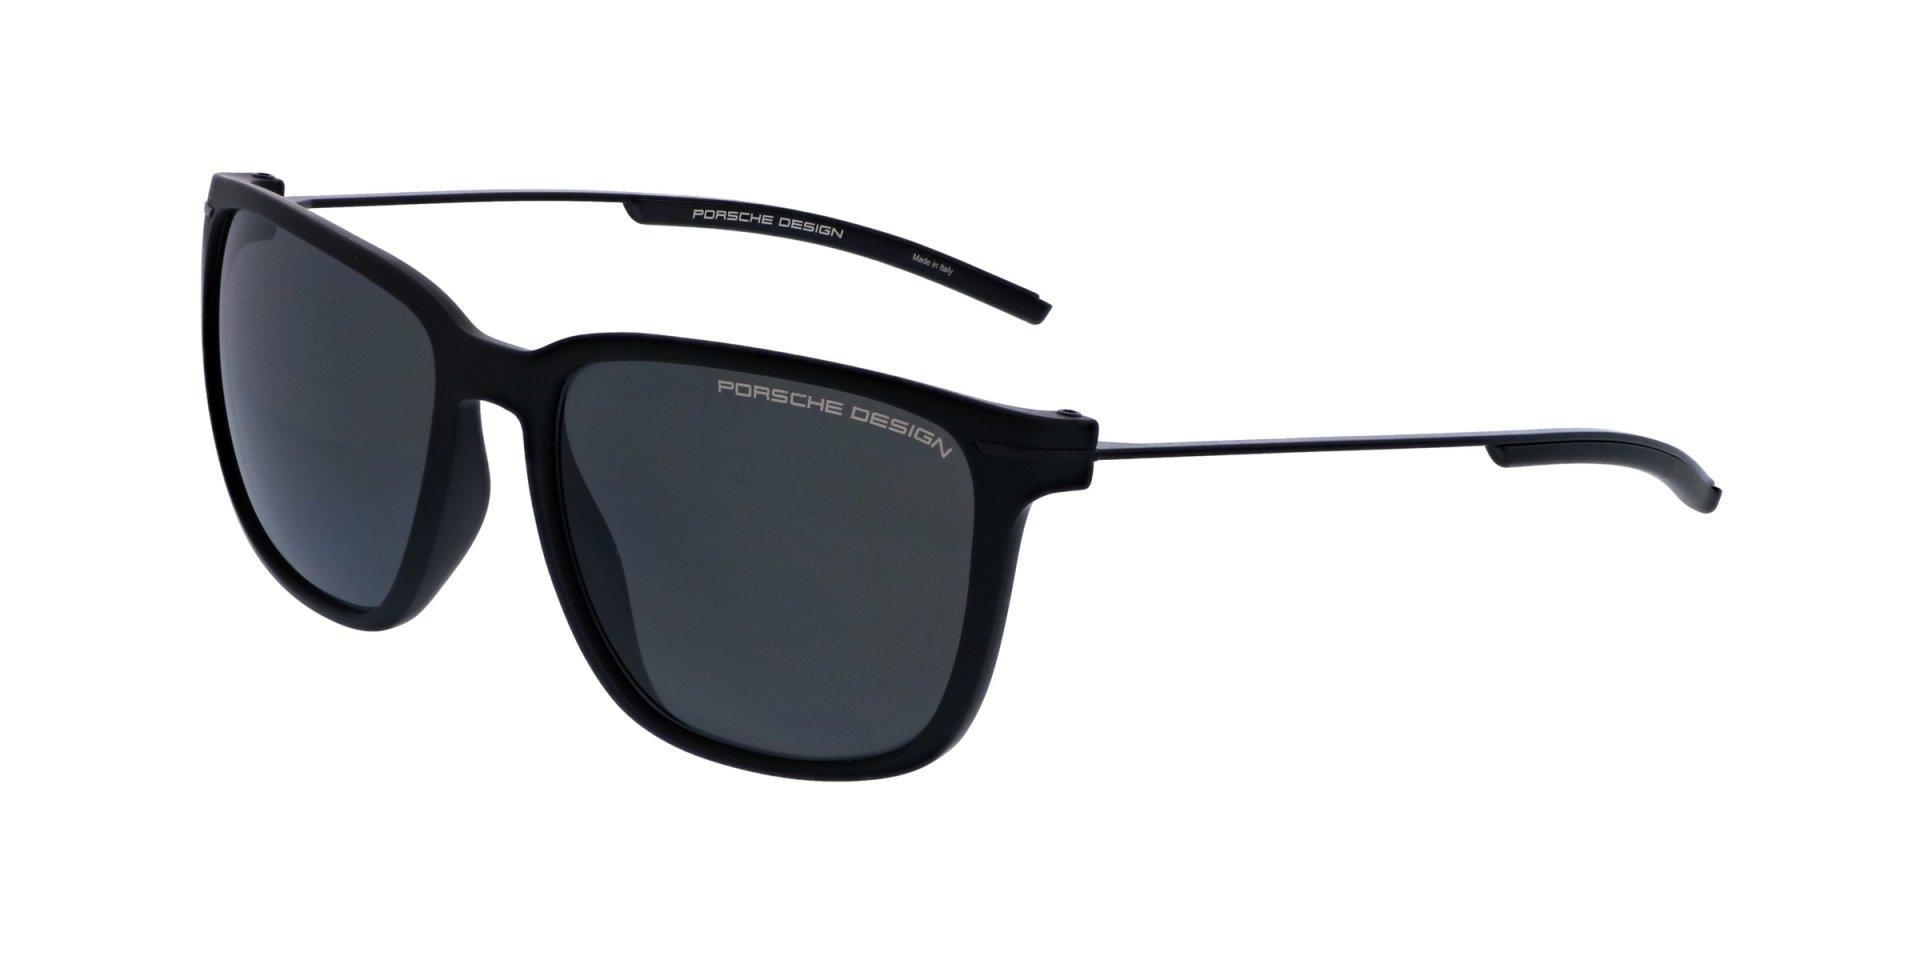 8edff567a594 Sunglasses PORSCHE DESIGN